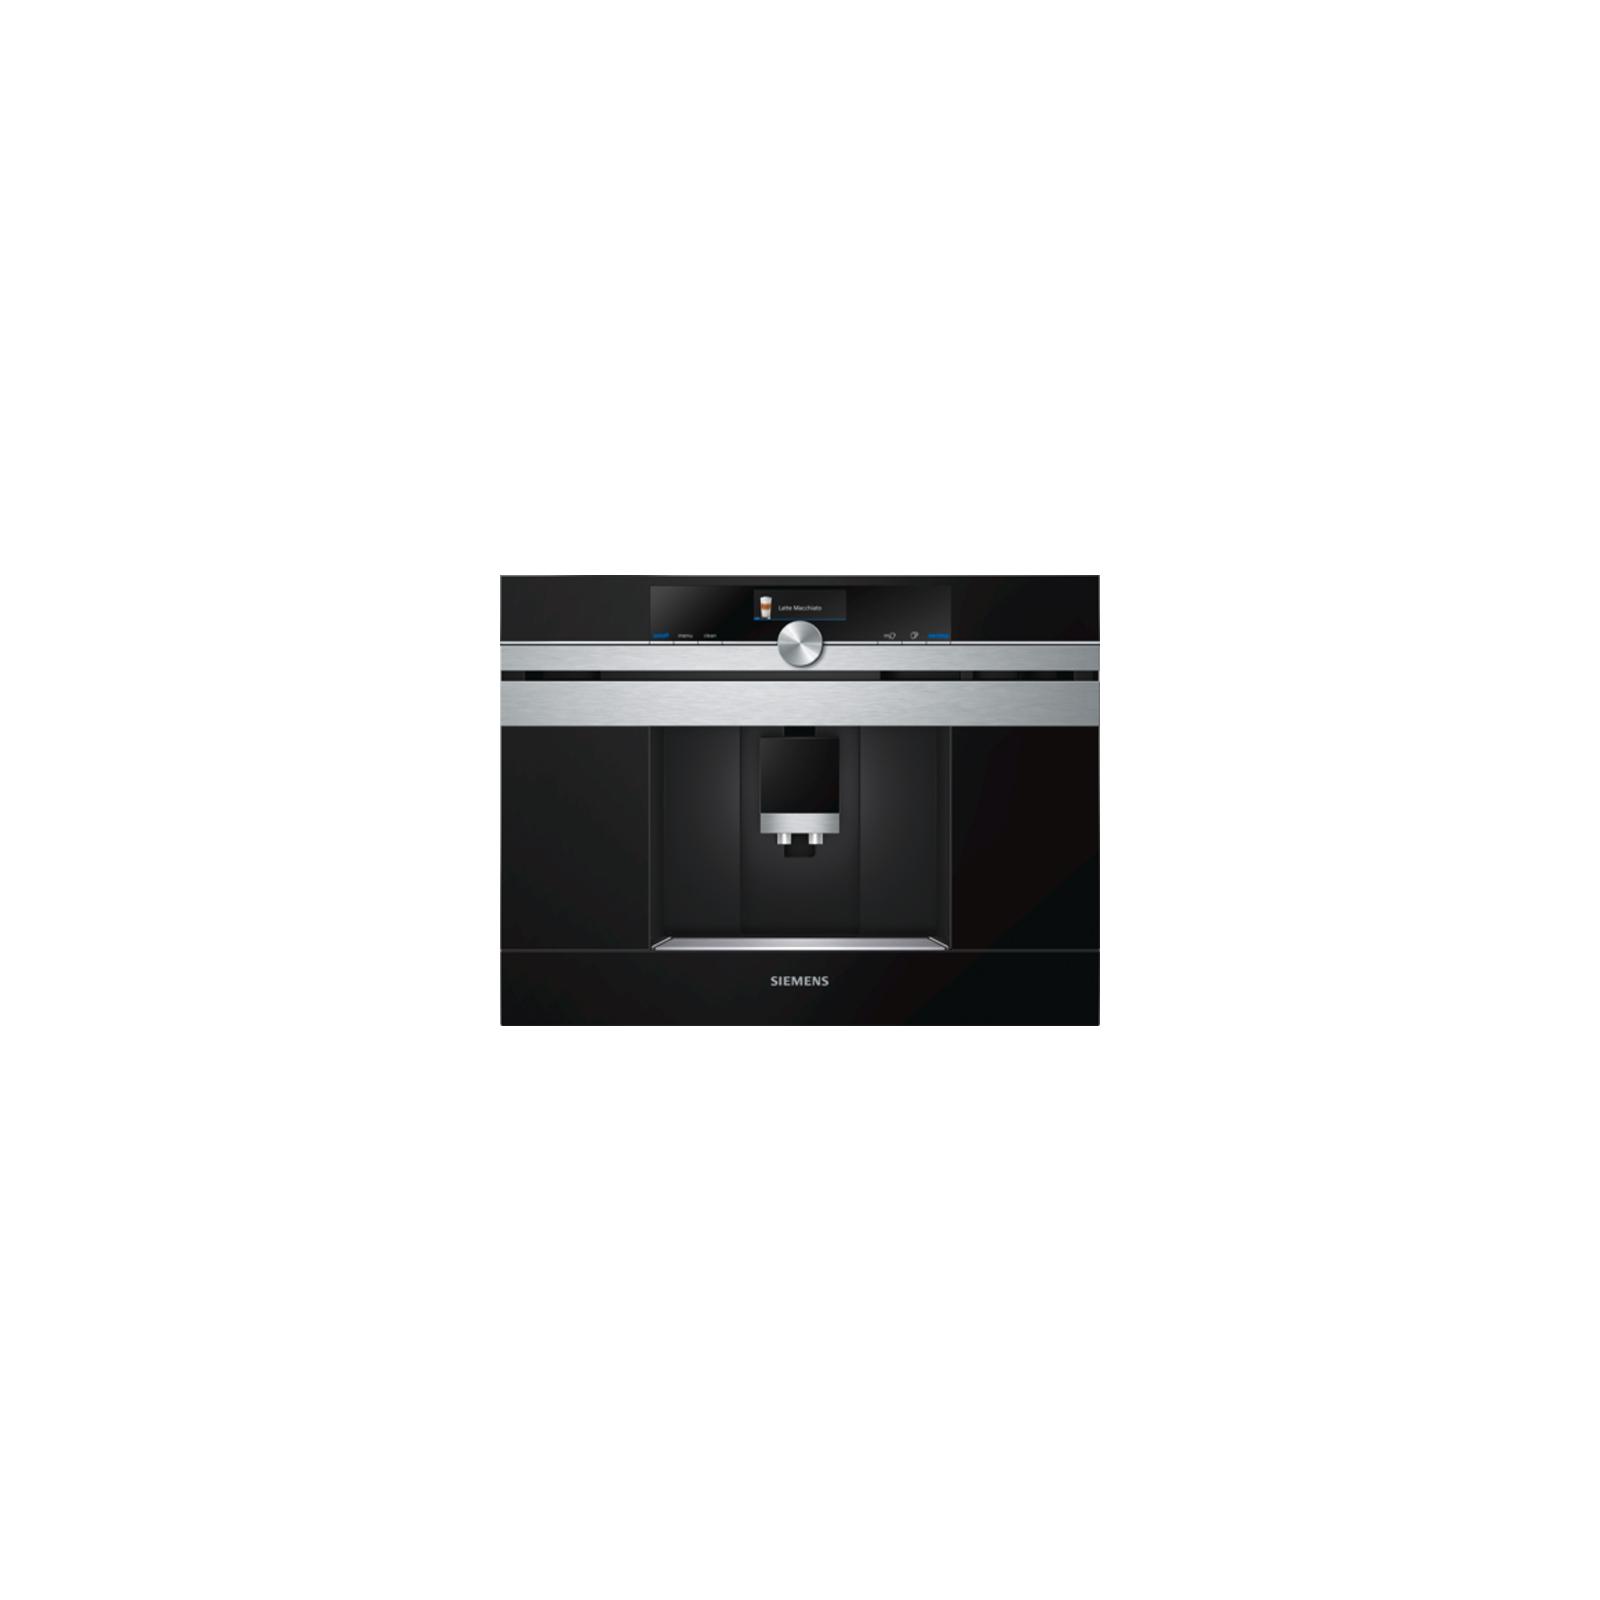 Кофеварка Siemens CT 636 LES1 (CT636LES1)